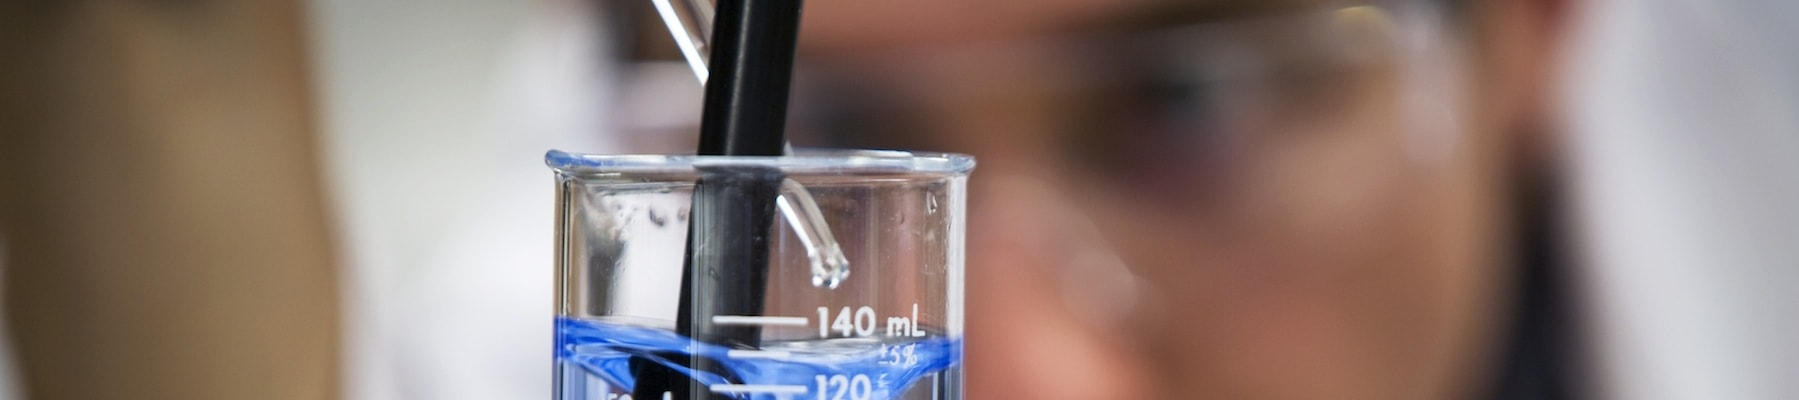 Chemist-in-Lab-Focus-on-Beaker-Close-Up-000008476990_Full-min